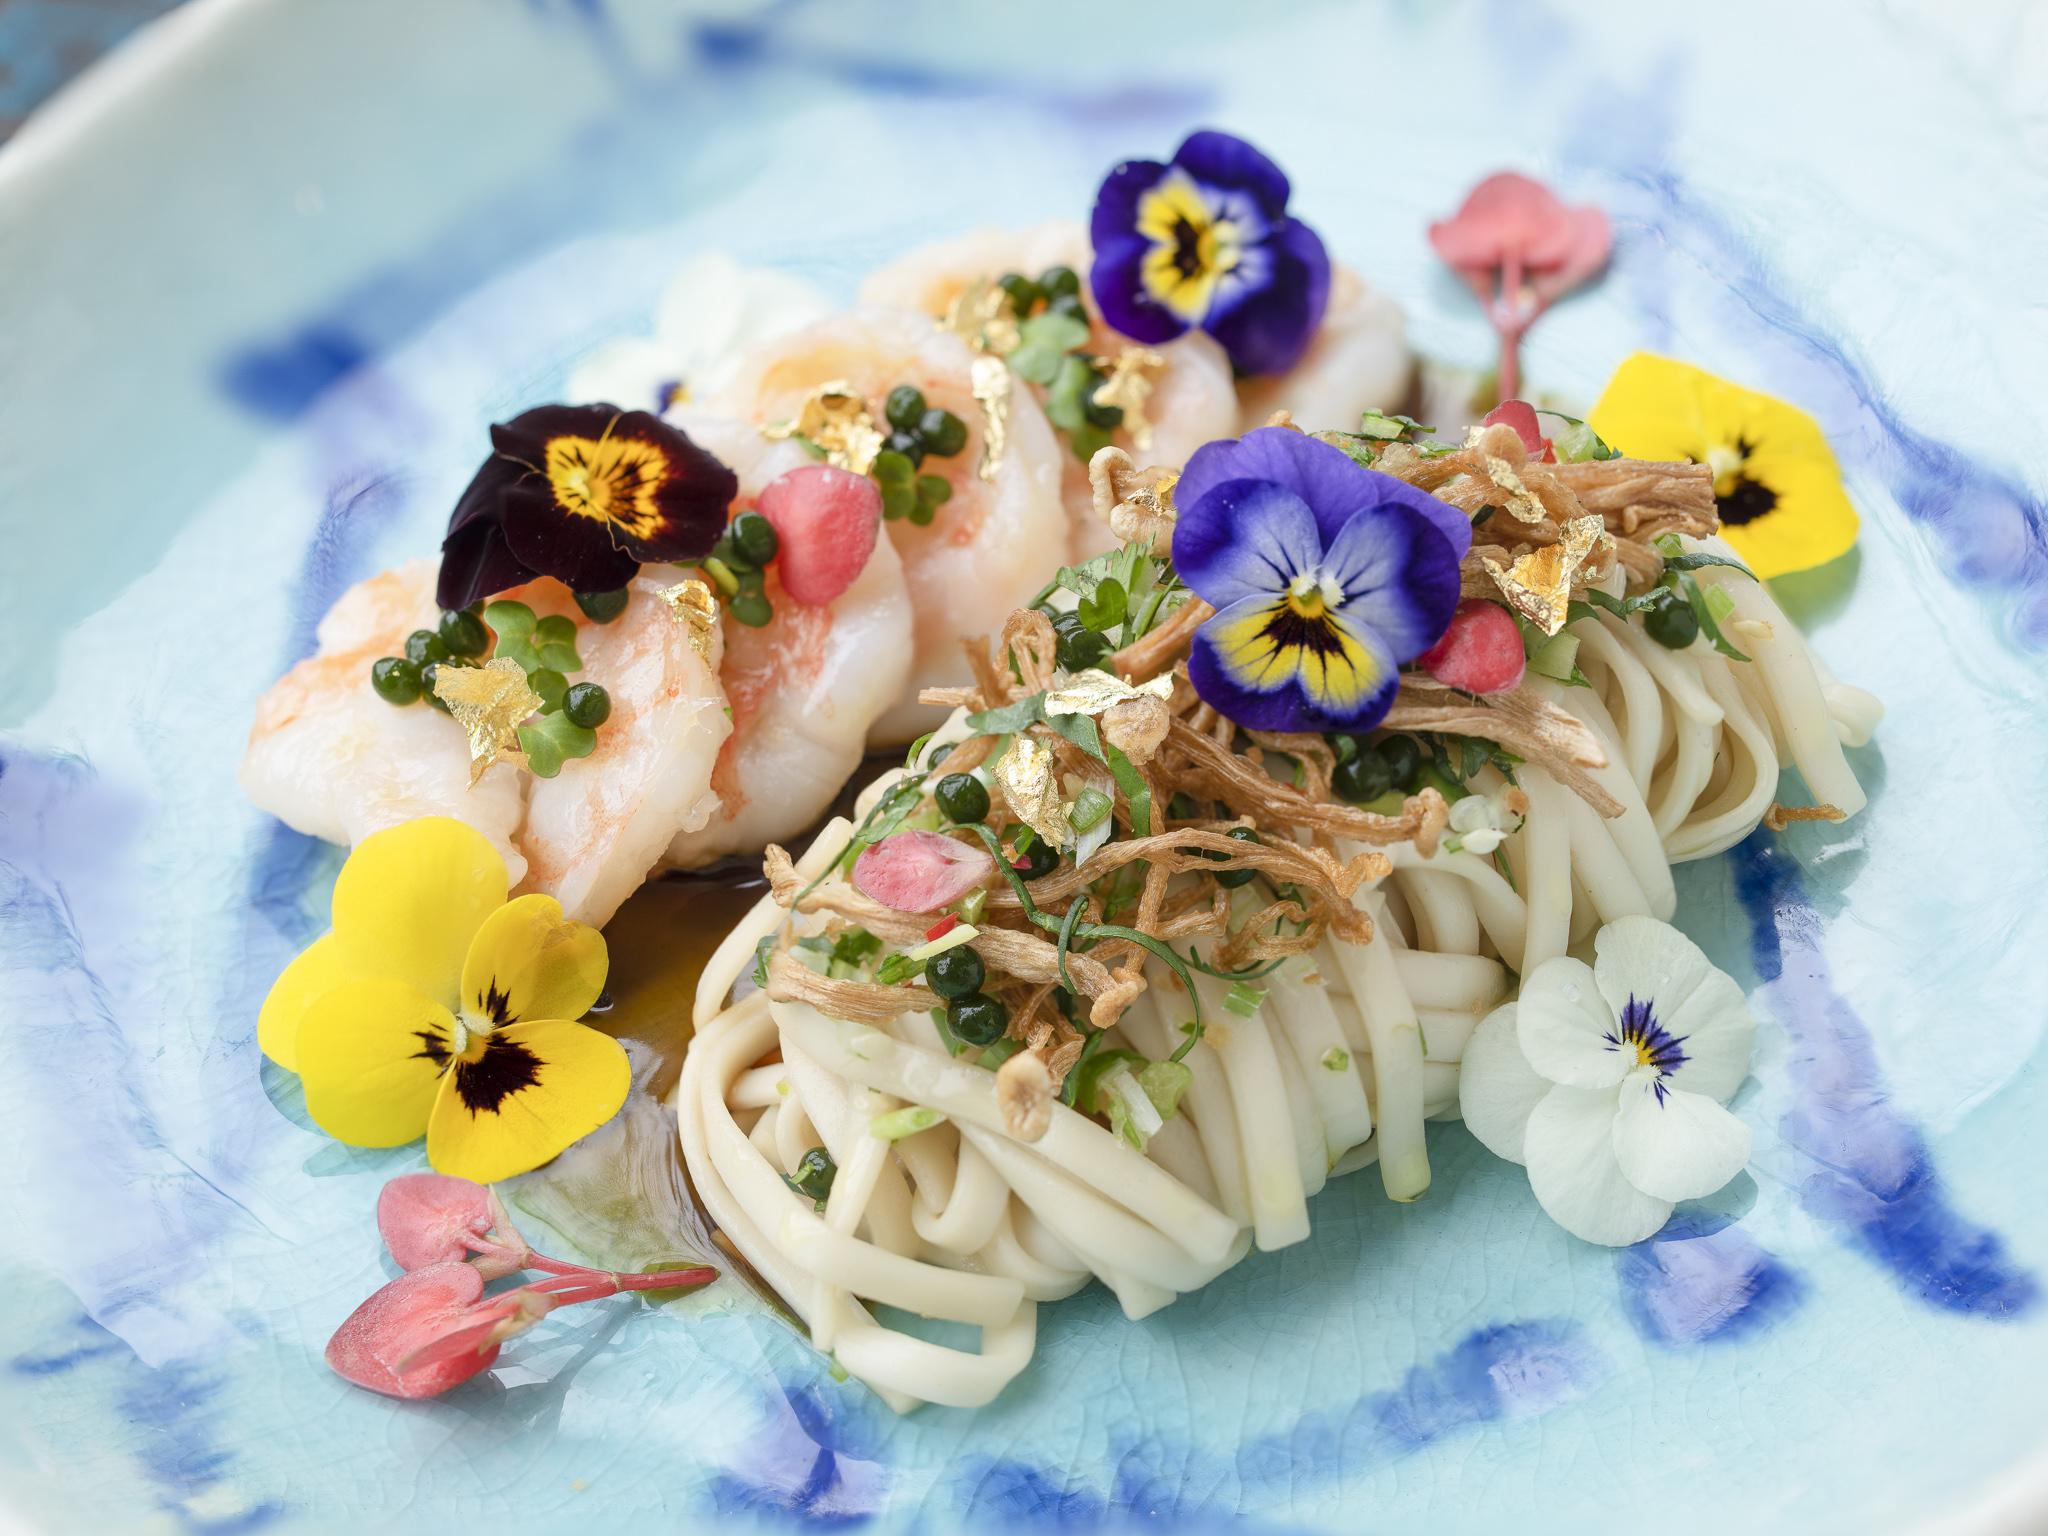 Kai Mayfair - Lai Mien Noodle with Prawns and Enoki Mushrooms.jpg